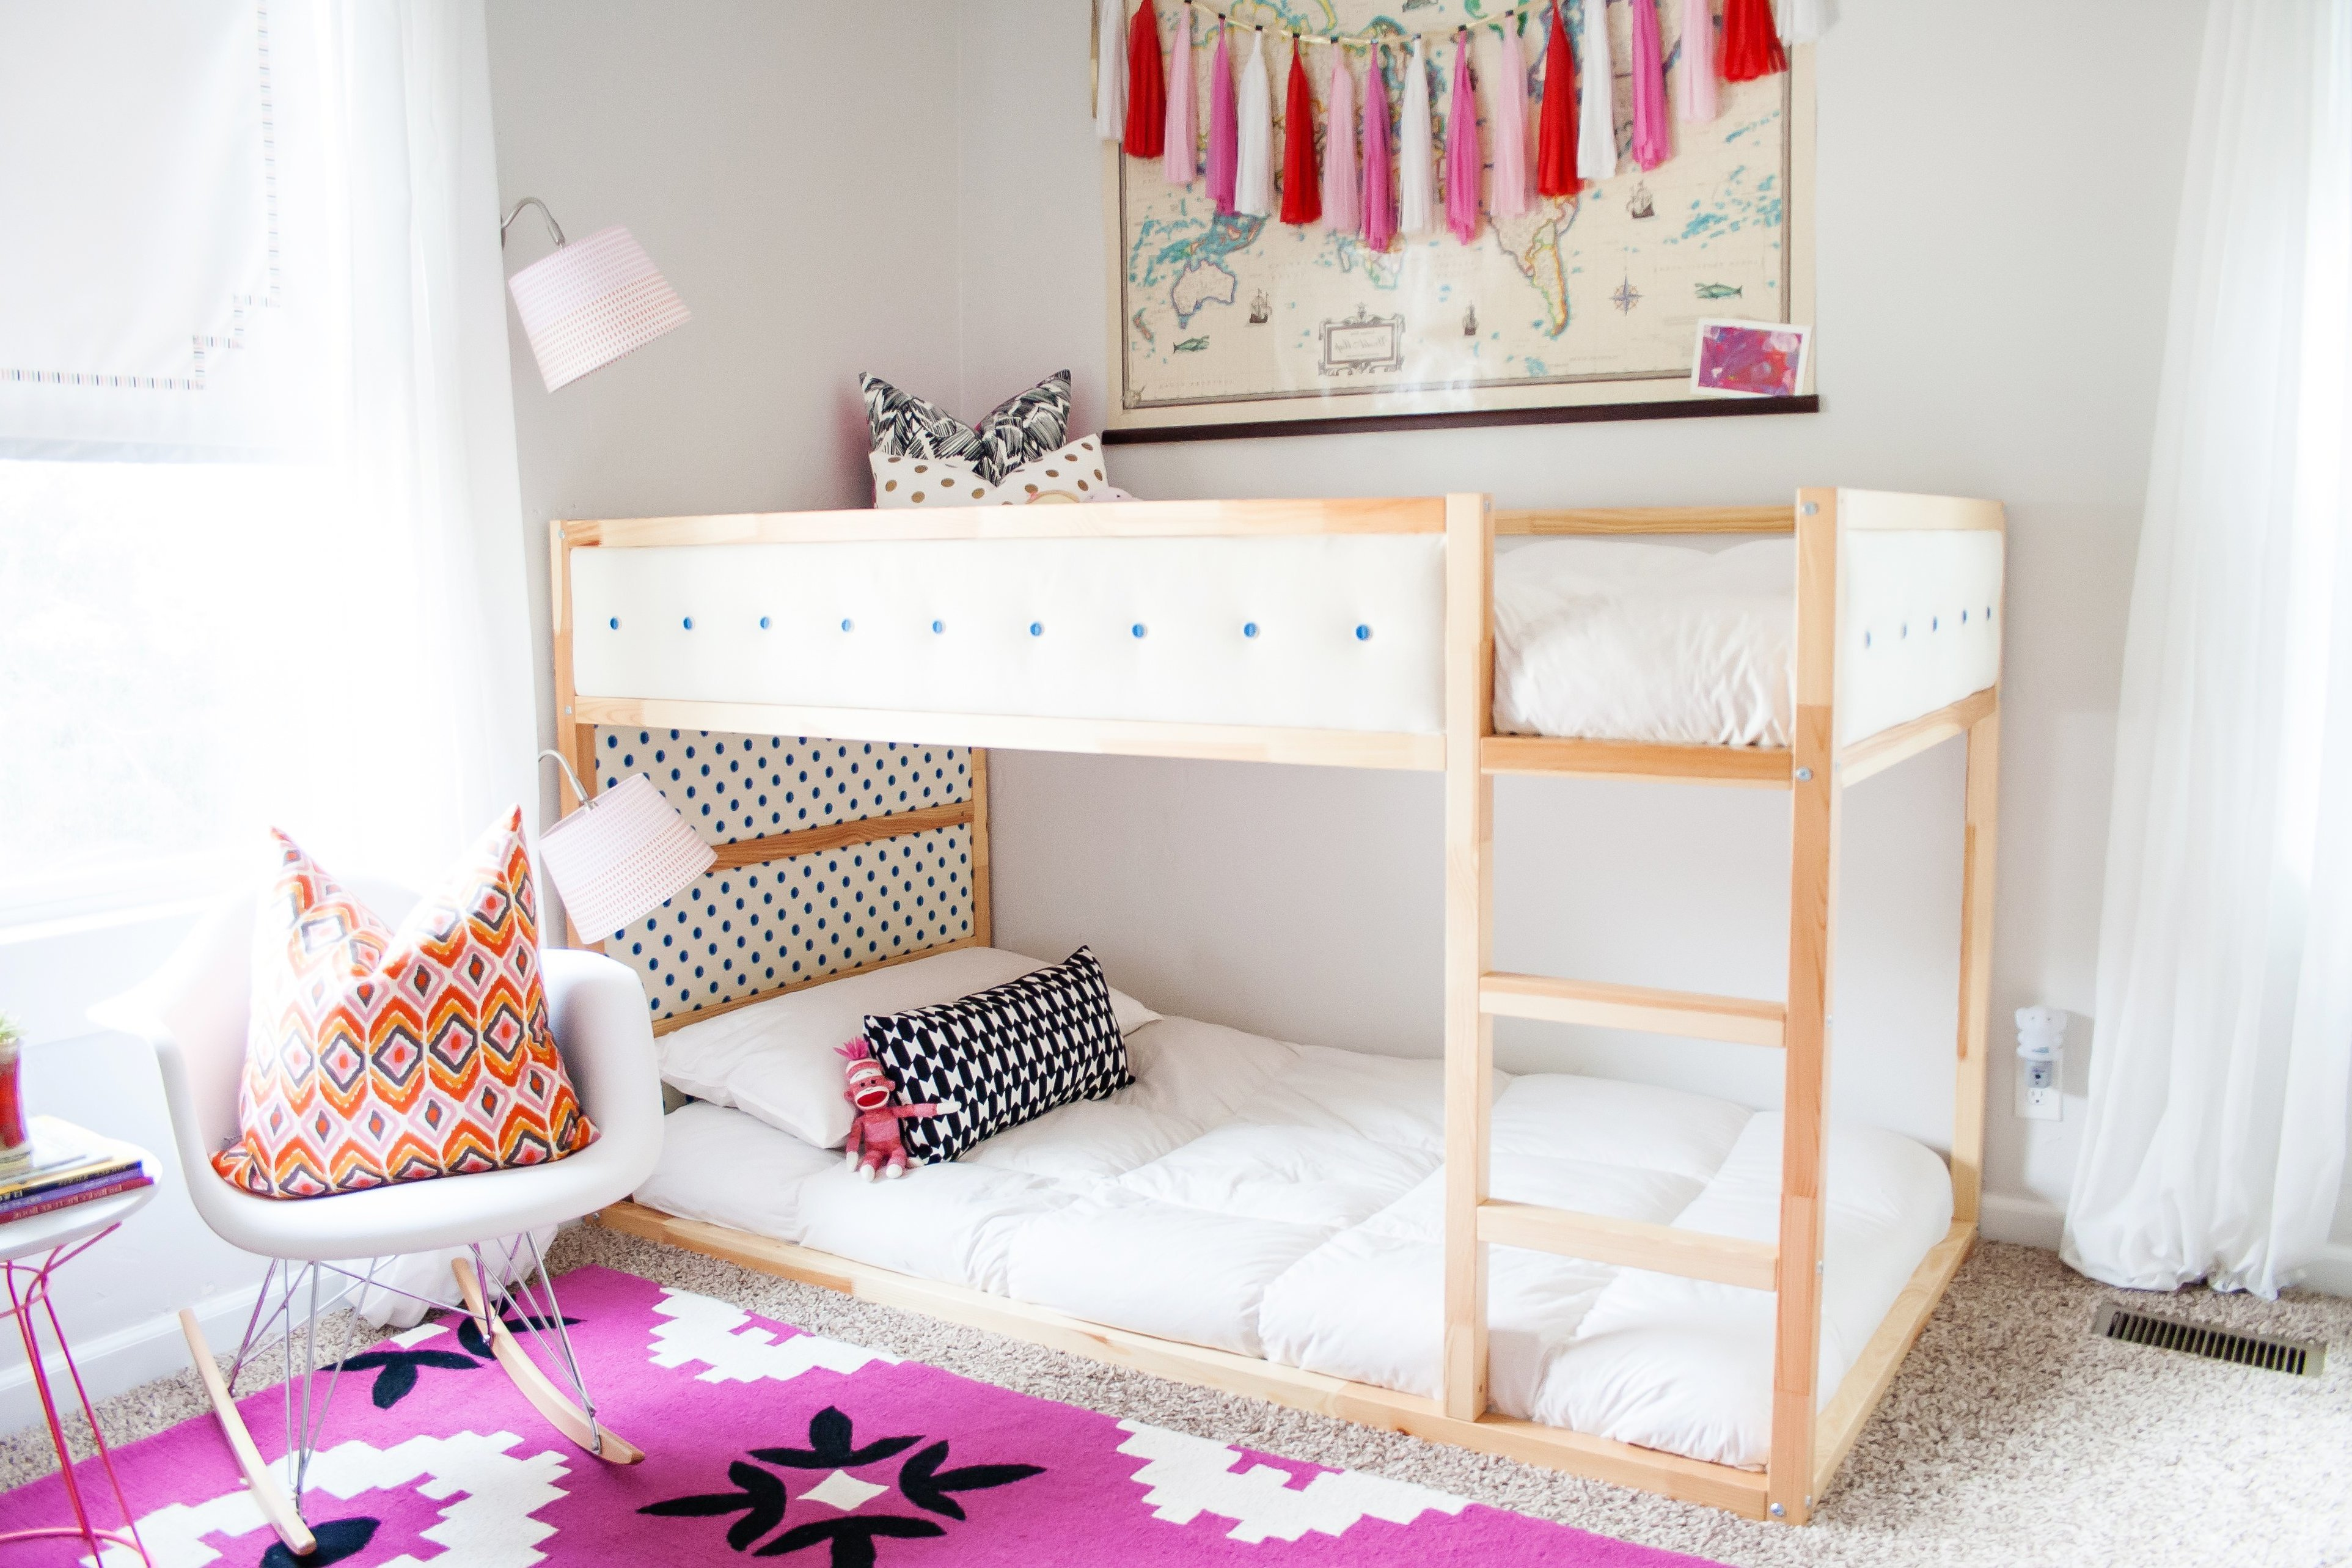 Kura Ikea Bett Hacks - DIY Ideen zum Selbermachen